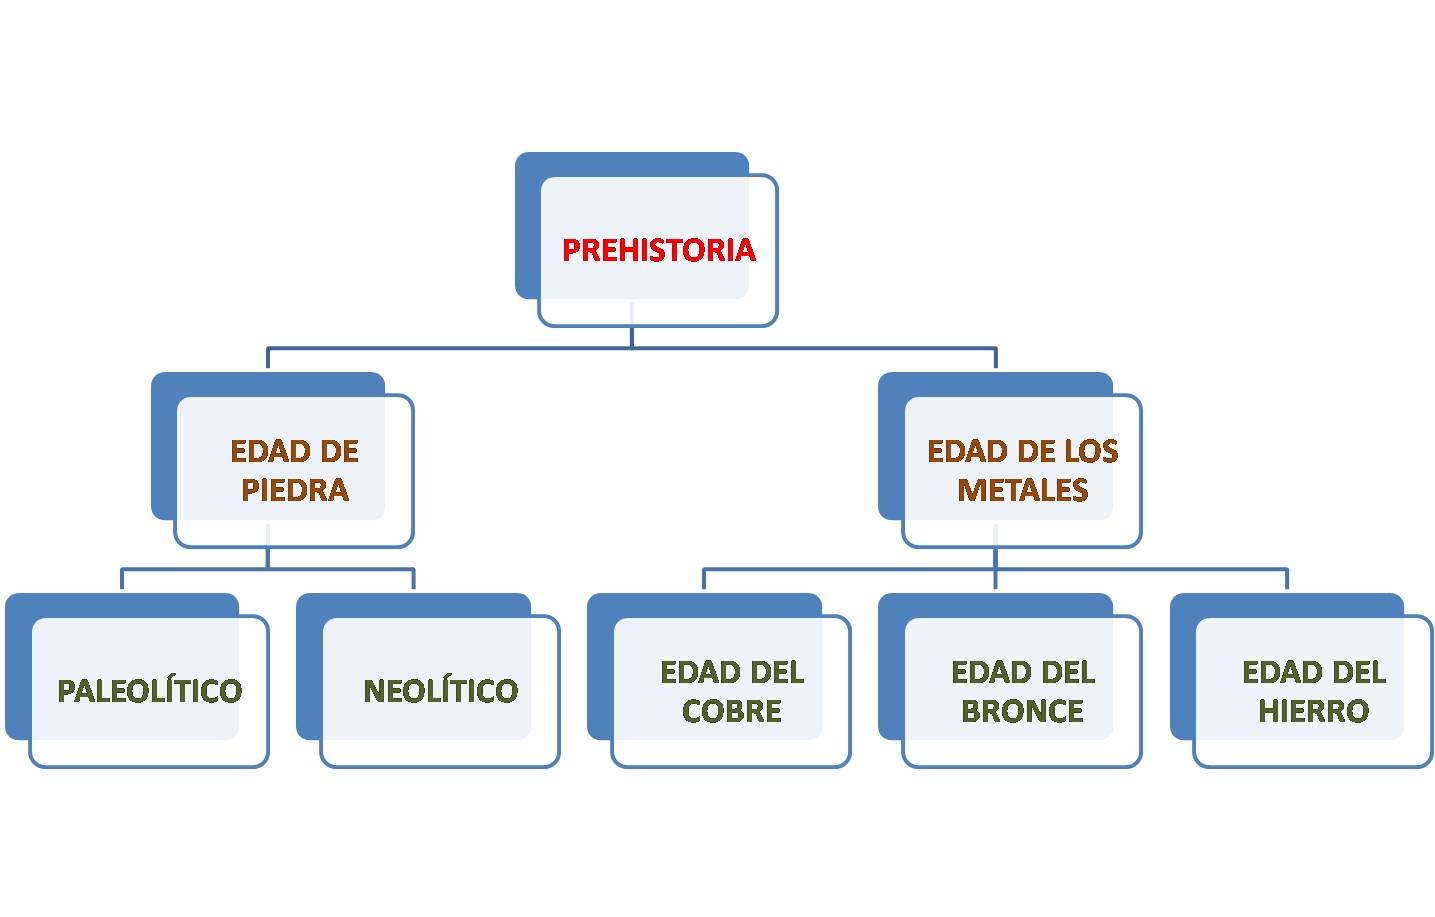 Tema 1 La Prehistoria Blog De Miguel ángel Suárez Umpiérrez